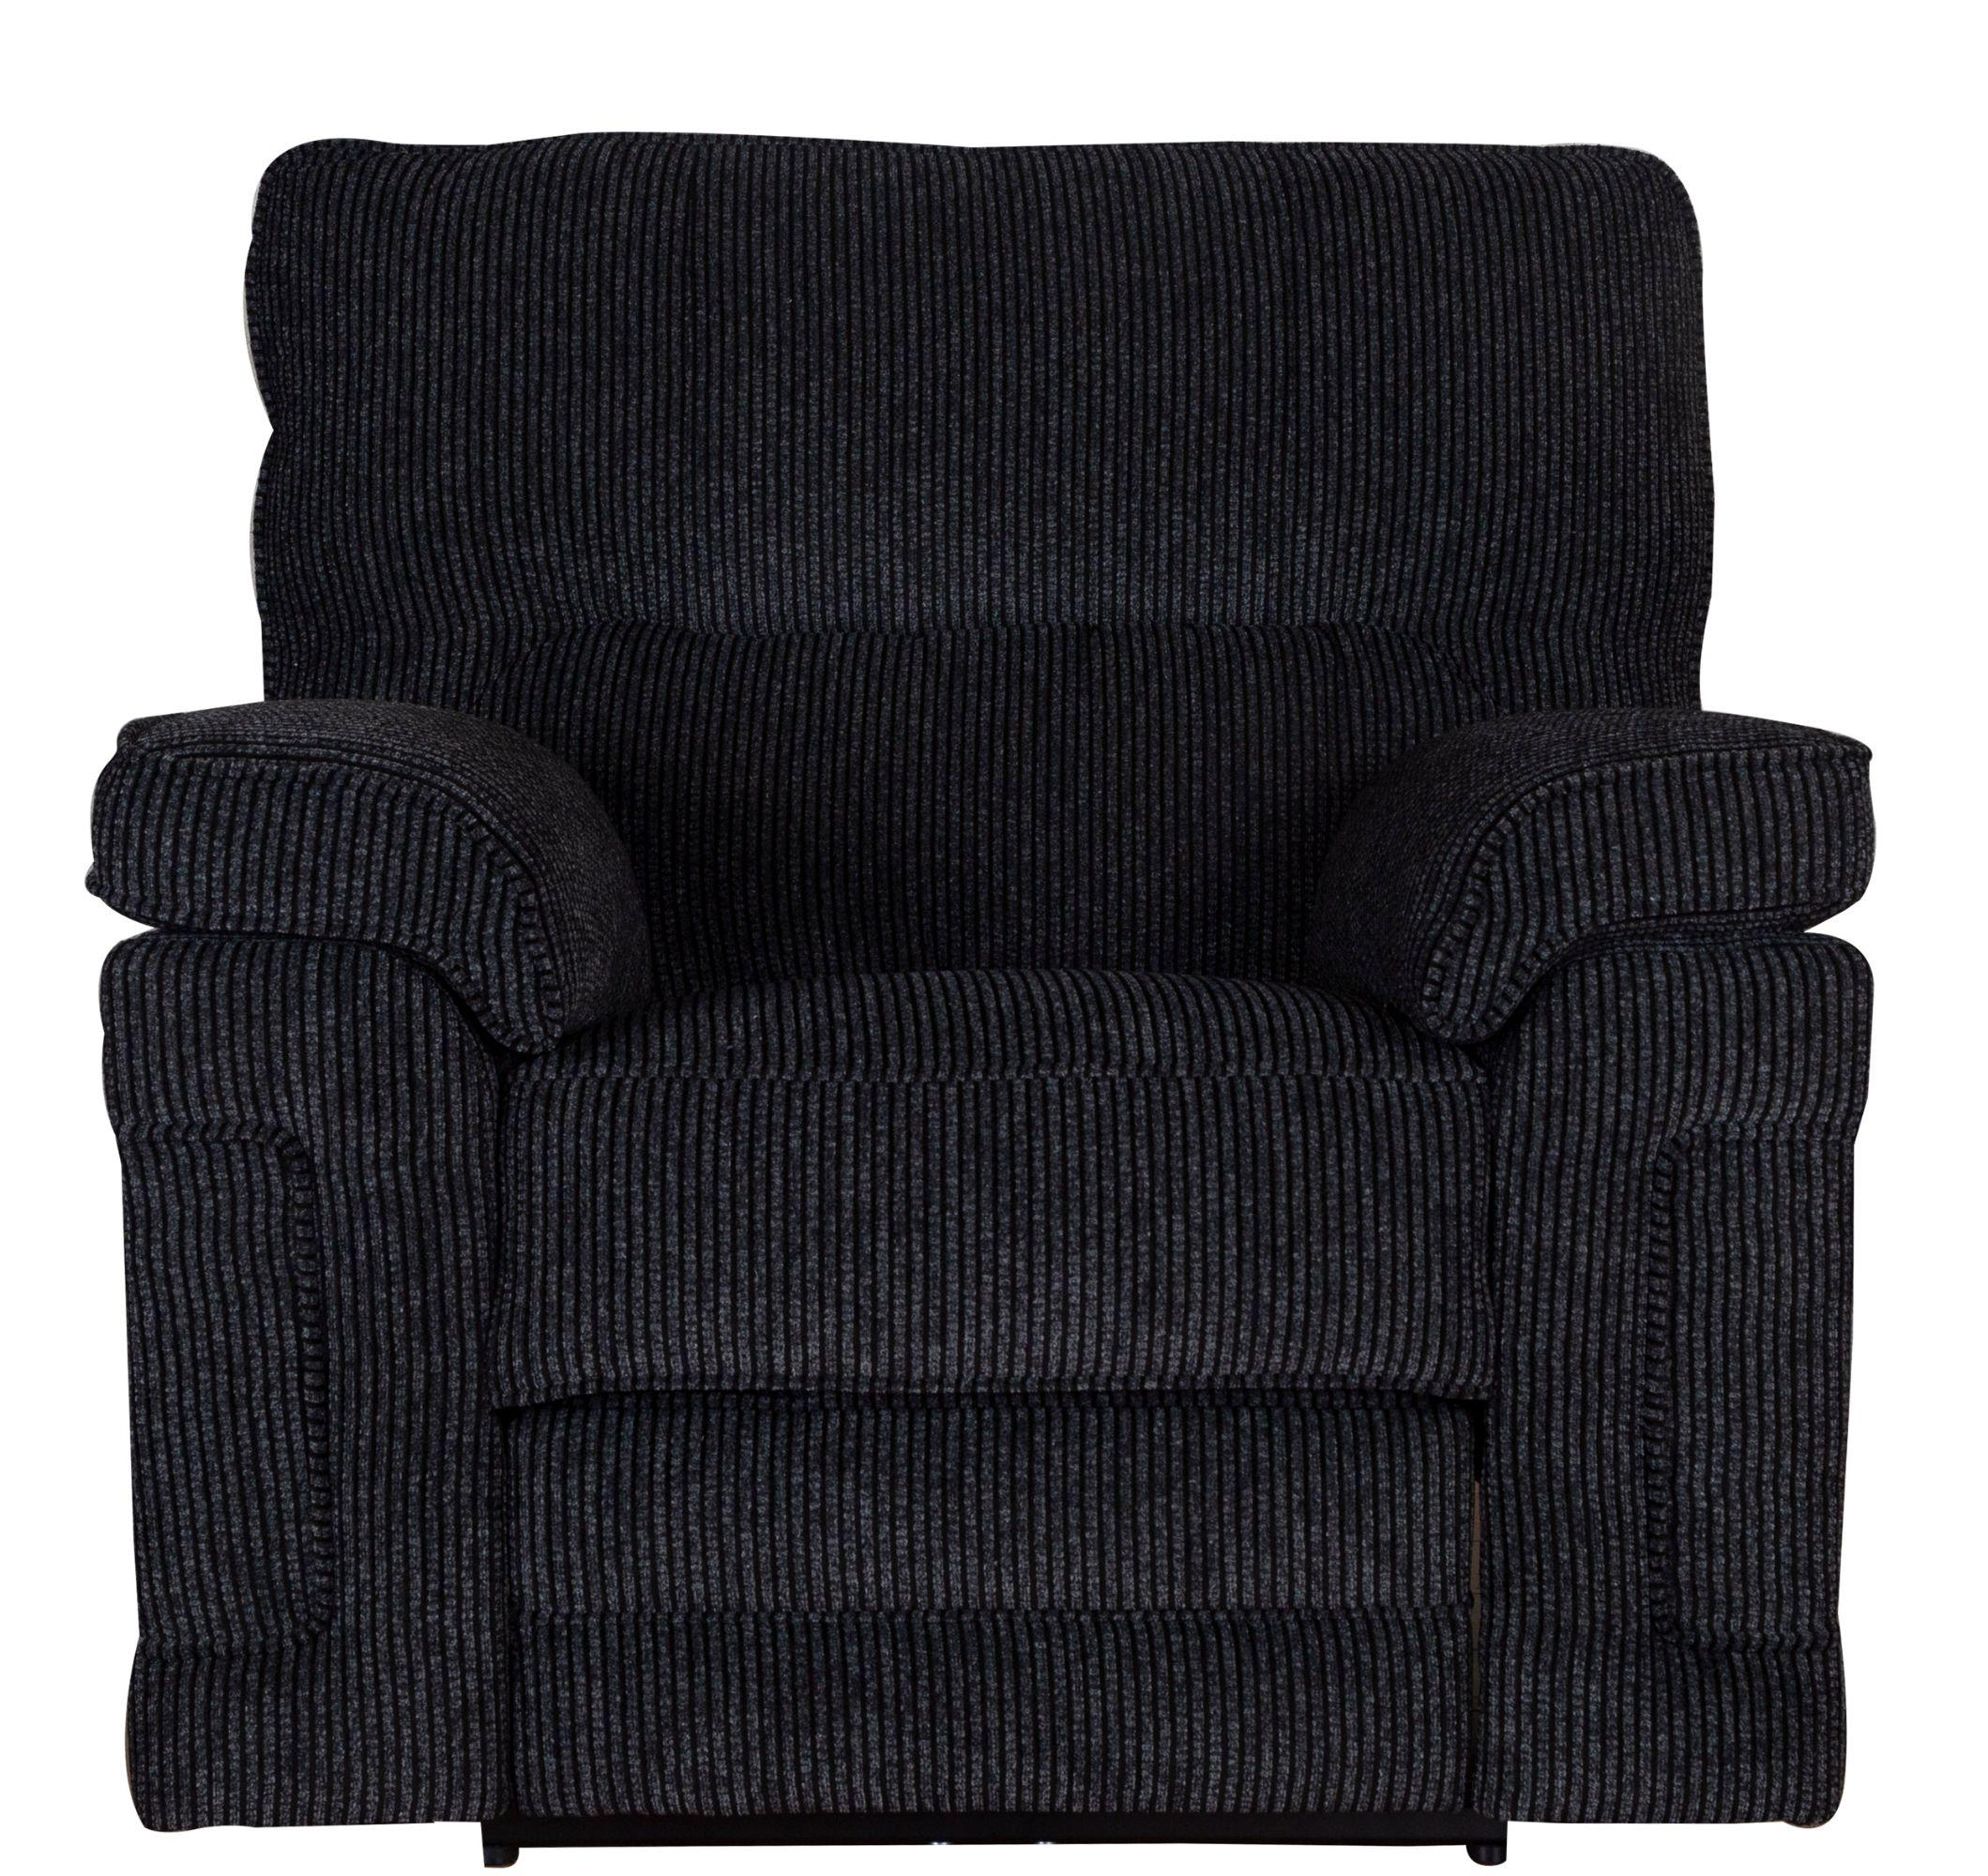 PLAYA Arm Chair Recliner